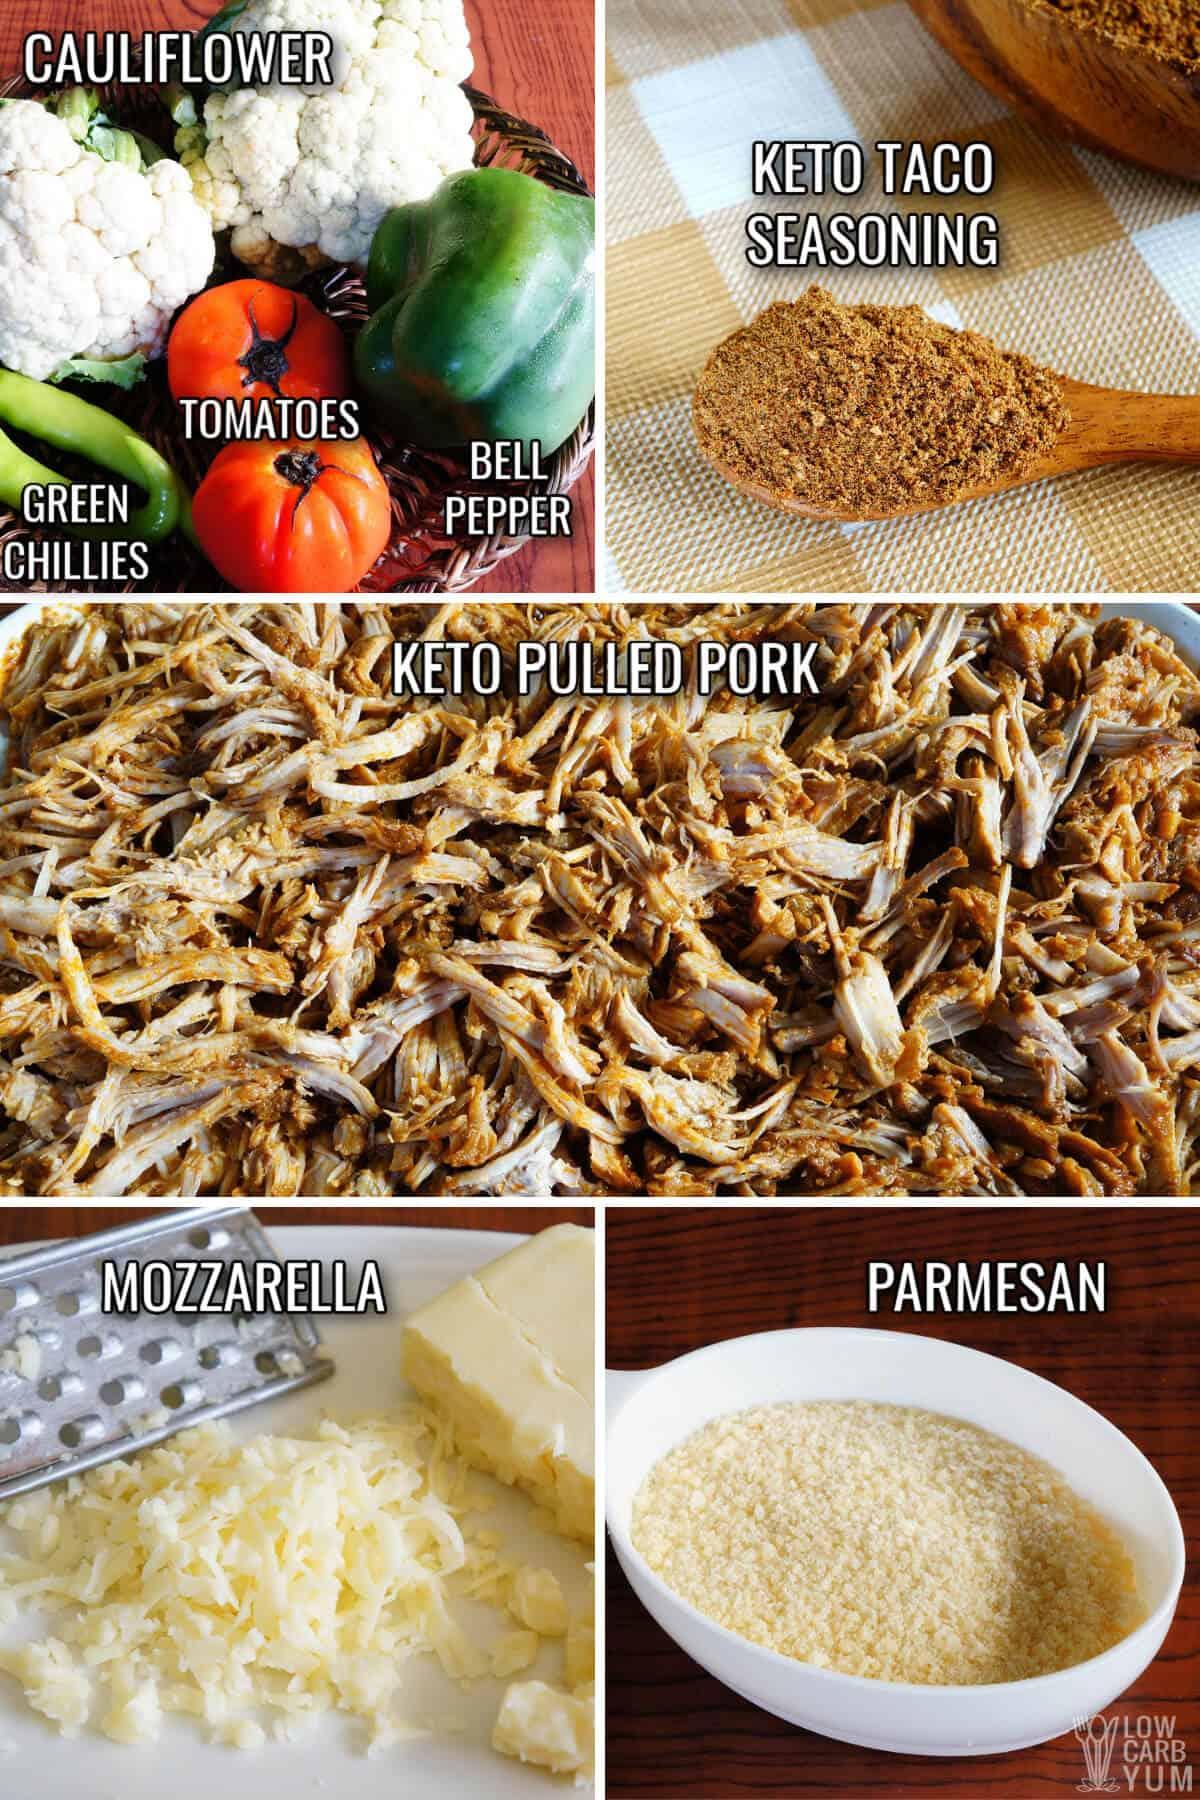 ingredients for the keto nachos